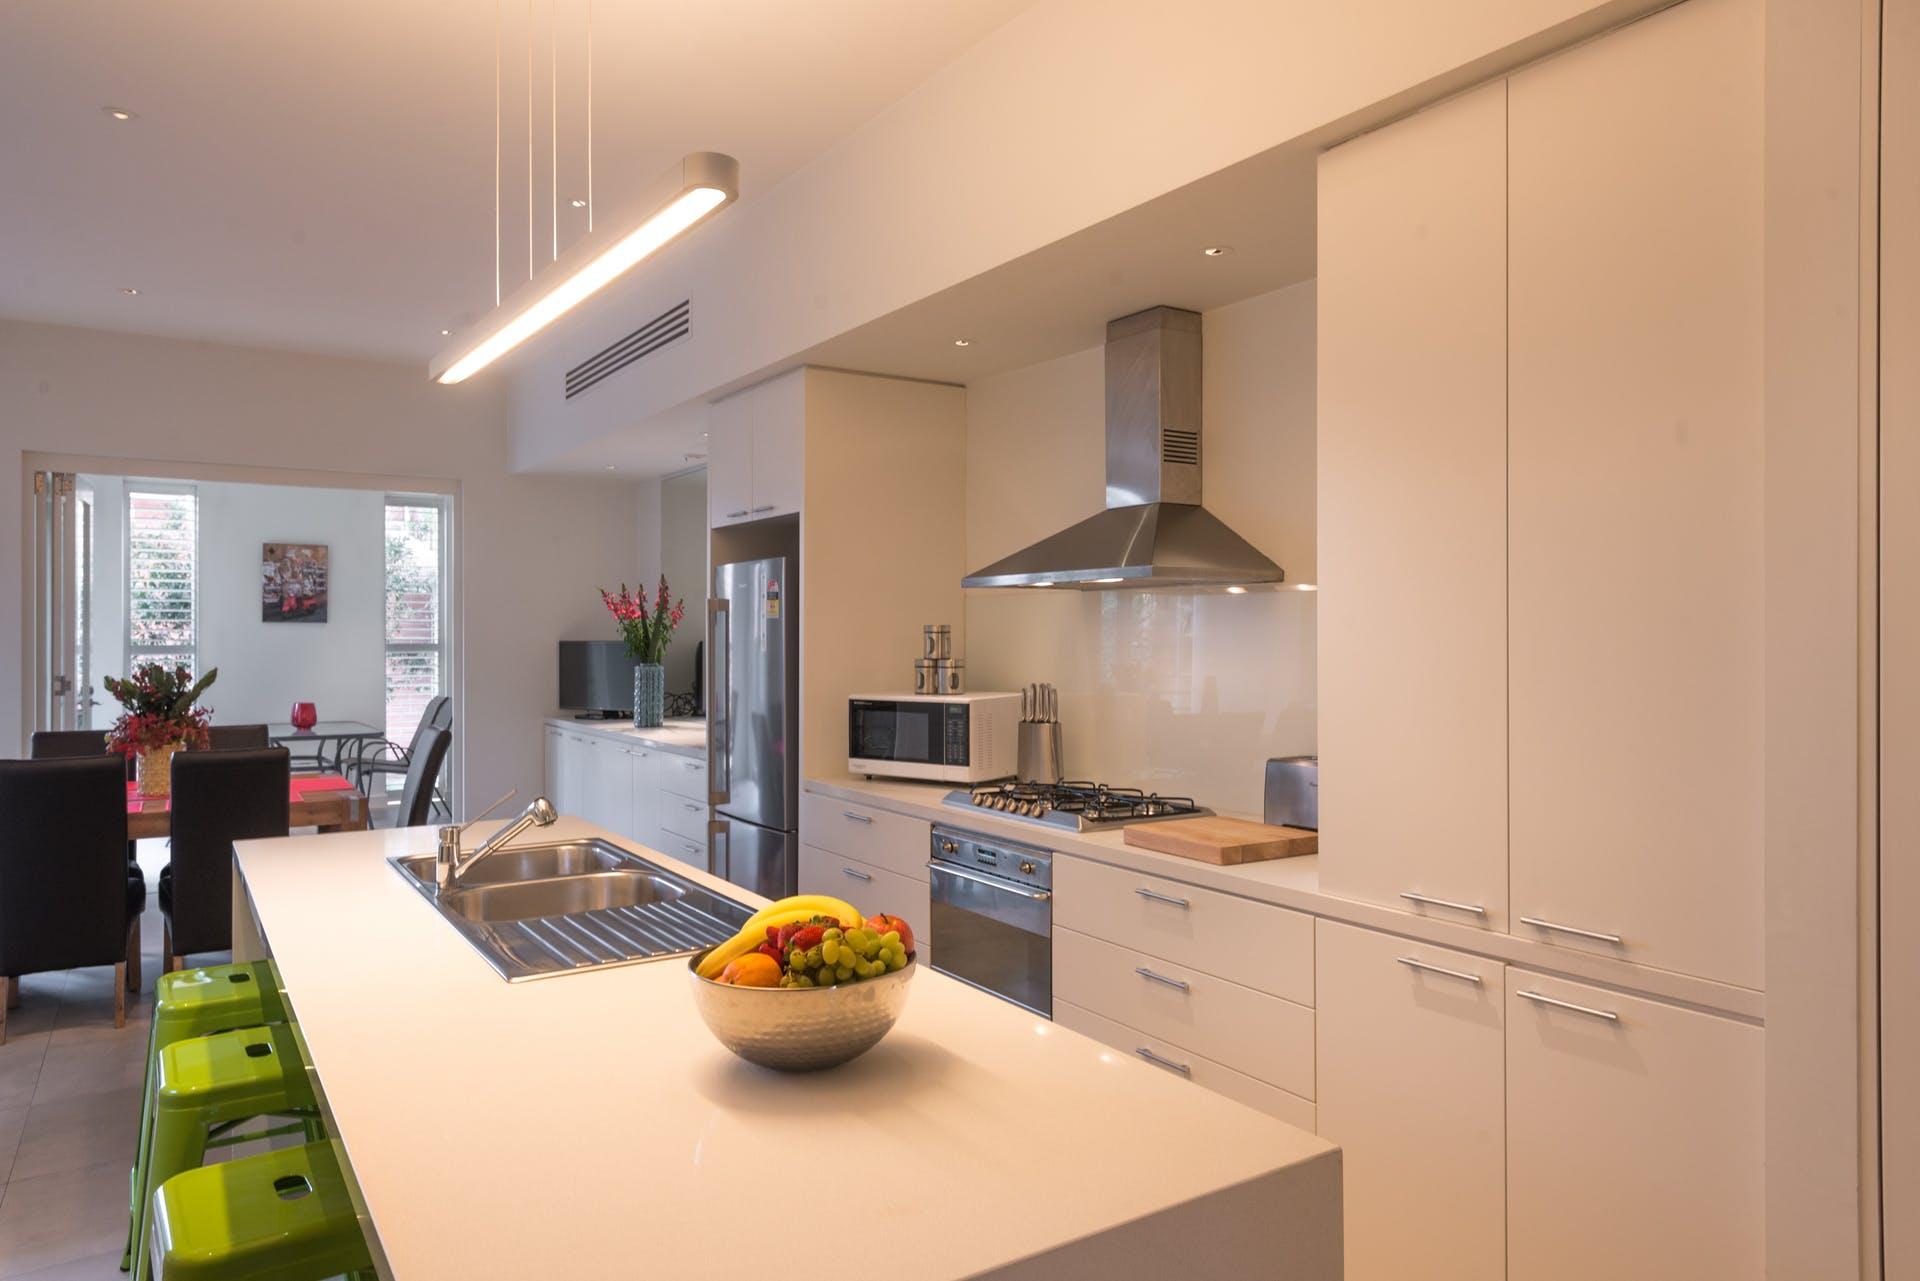 601-king-street-west-melbourne-student-accommodation-Melbourne-Kitchen-Unilodgers